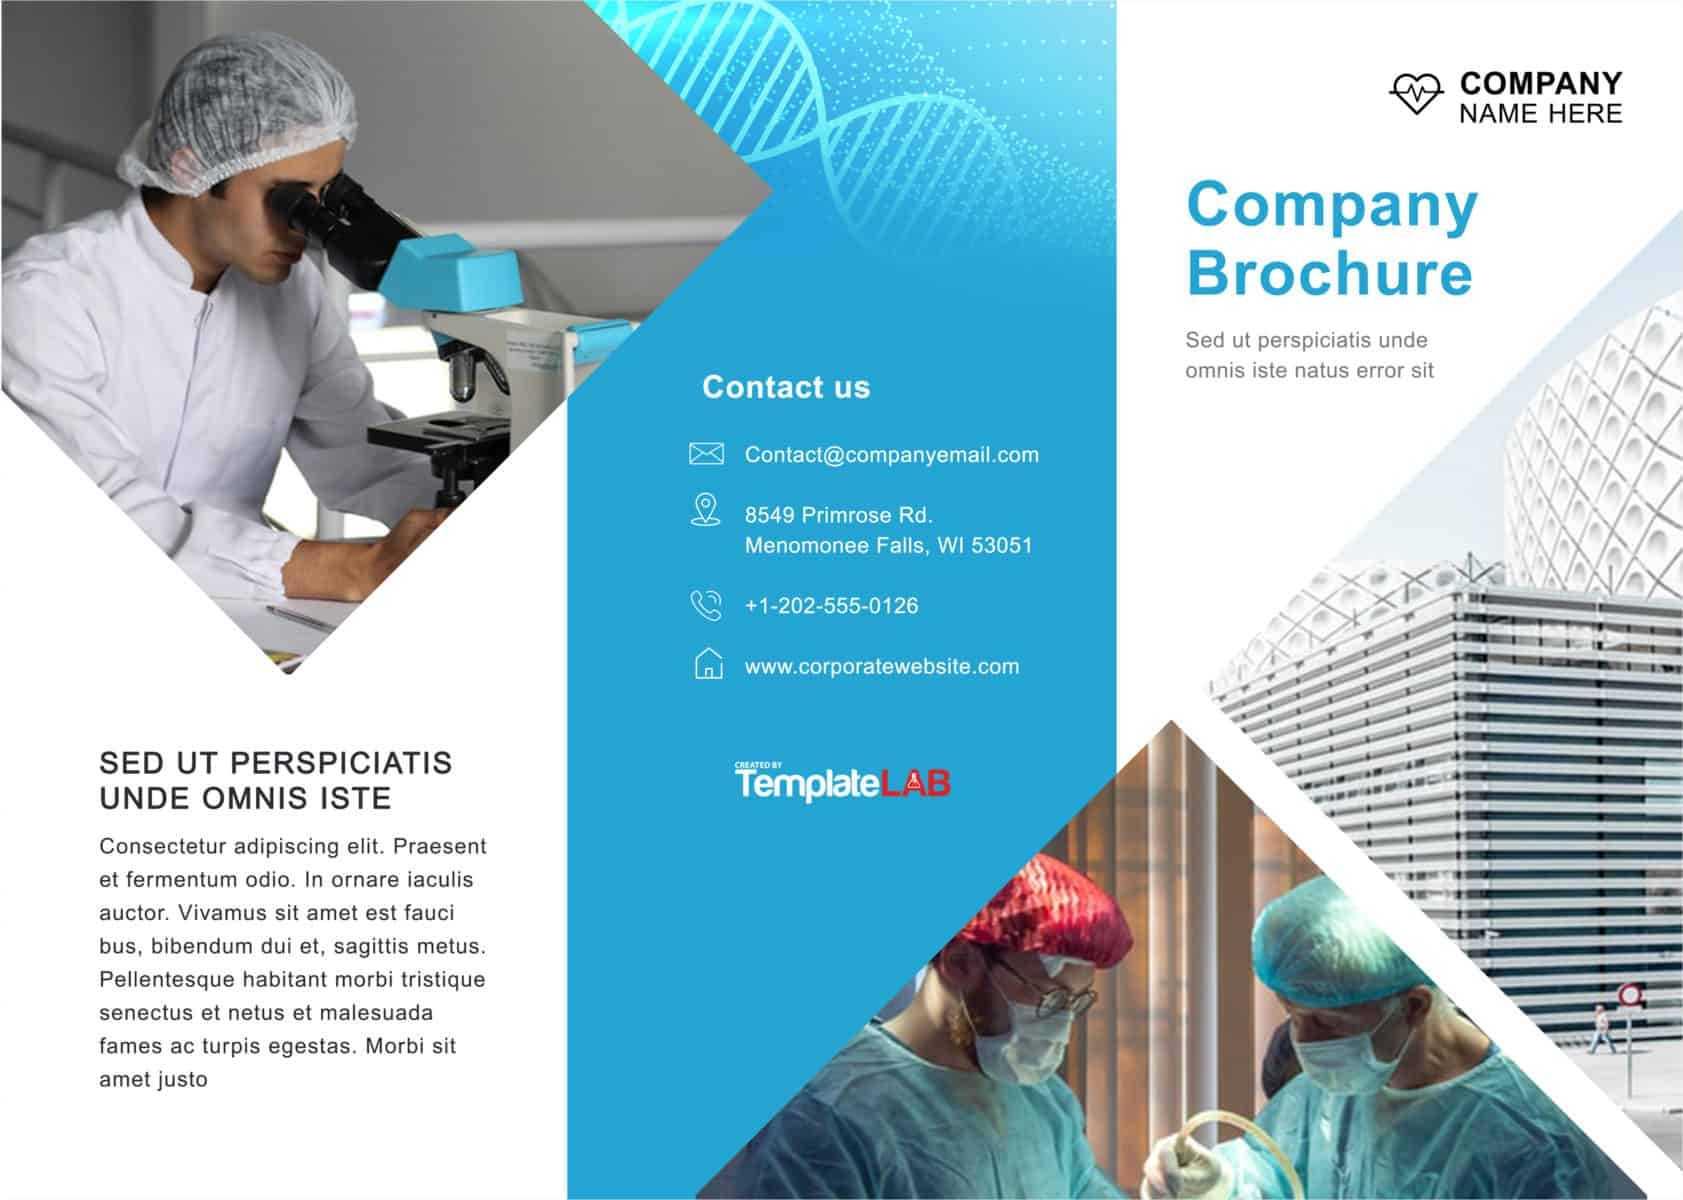 33 Free Brochure Templates (Word + Pdf) ᐅ Templatelab Regarding Engineering Brochure Templates Free Download